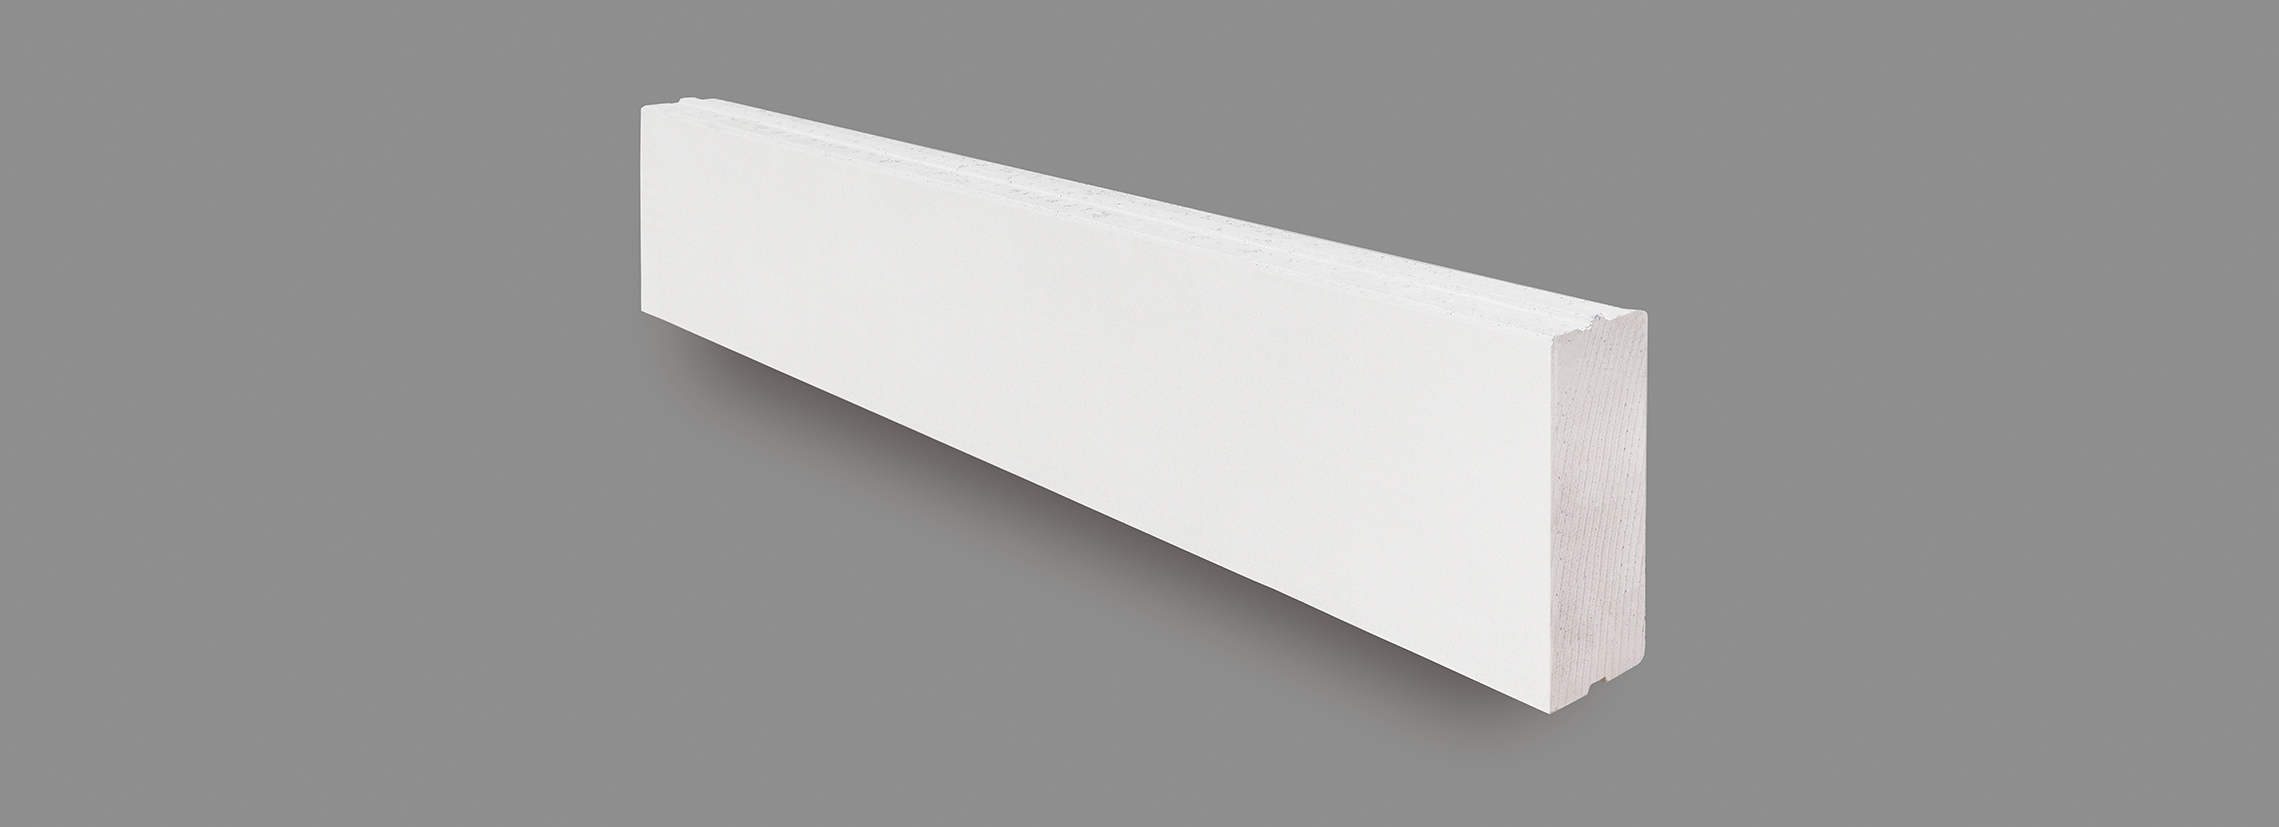 bauroc-Wandplatten